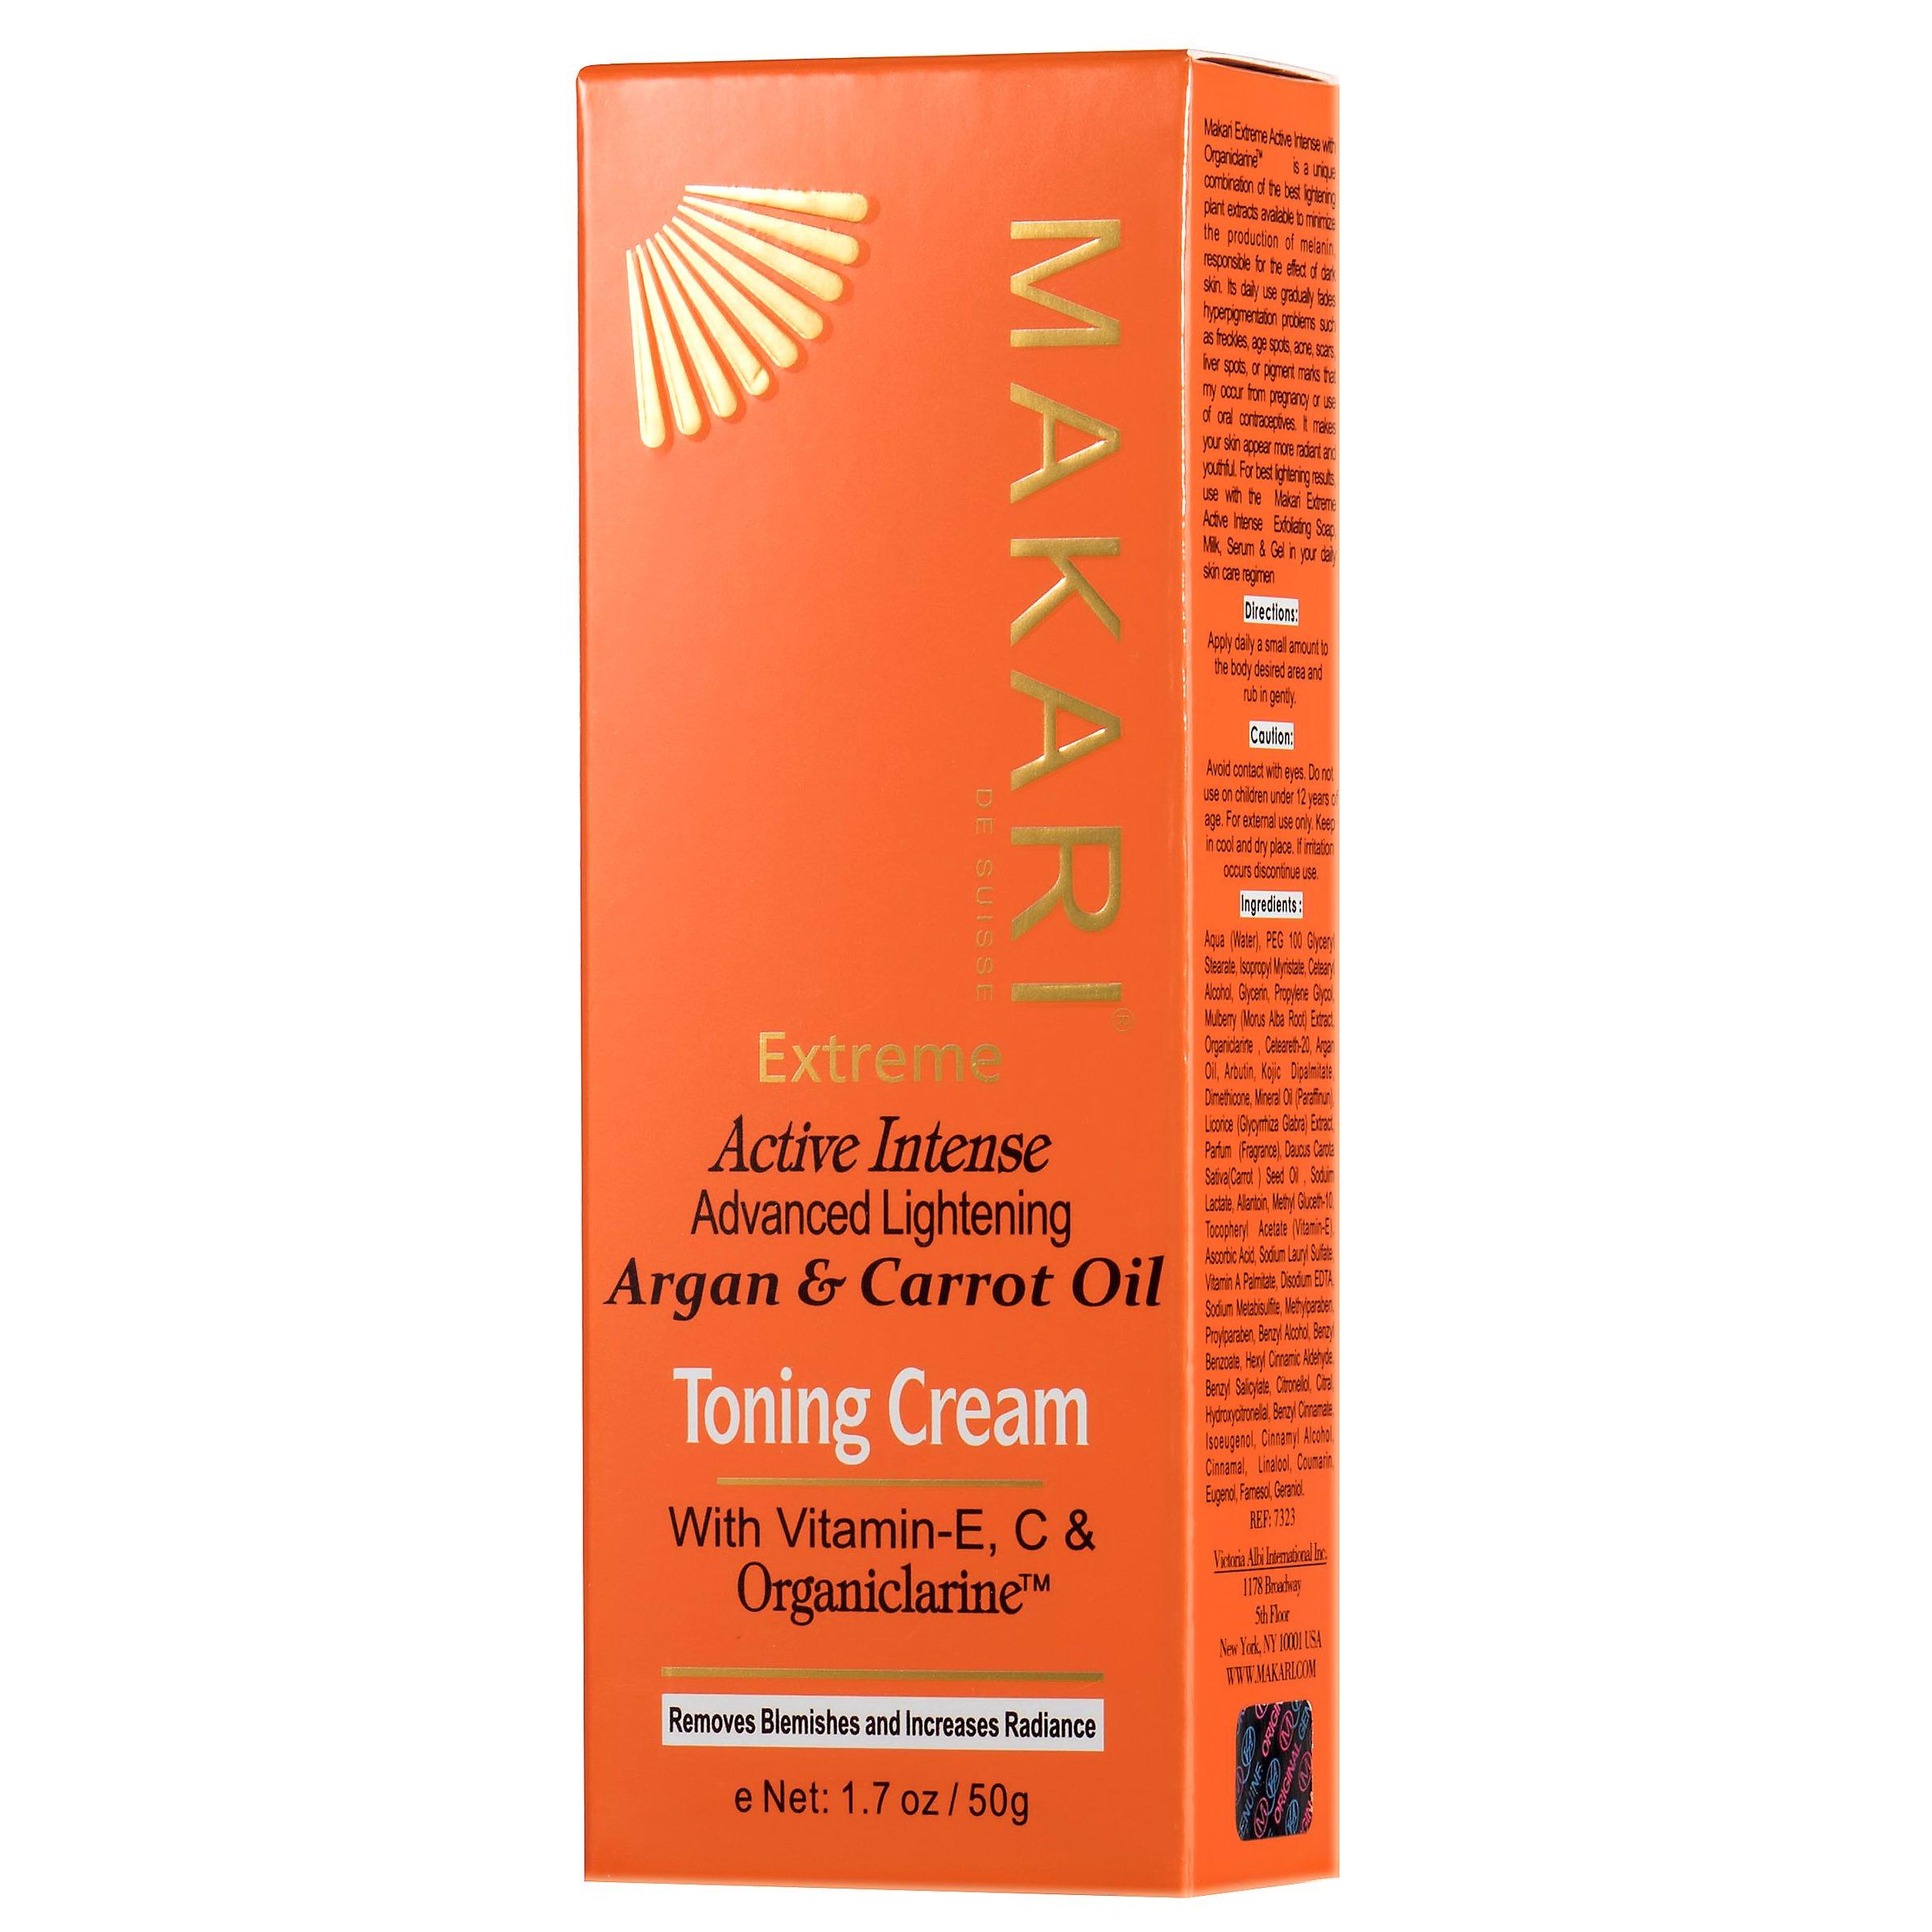 Makari Extreme Carrot & Argan Oil Facial Toning Cream 1.7oz – Lightening, Brightening & Tightening Moisturizer with Organiclarine – Anti-Aging Whitening Treatment for Dark Spots, Acne